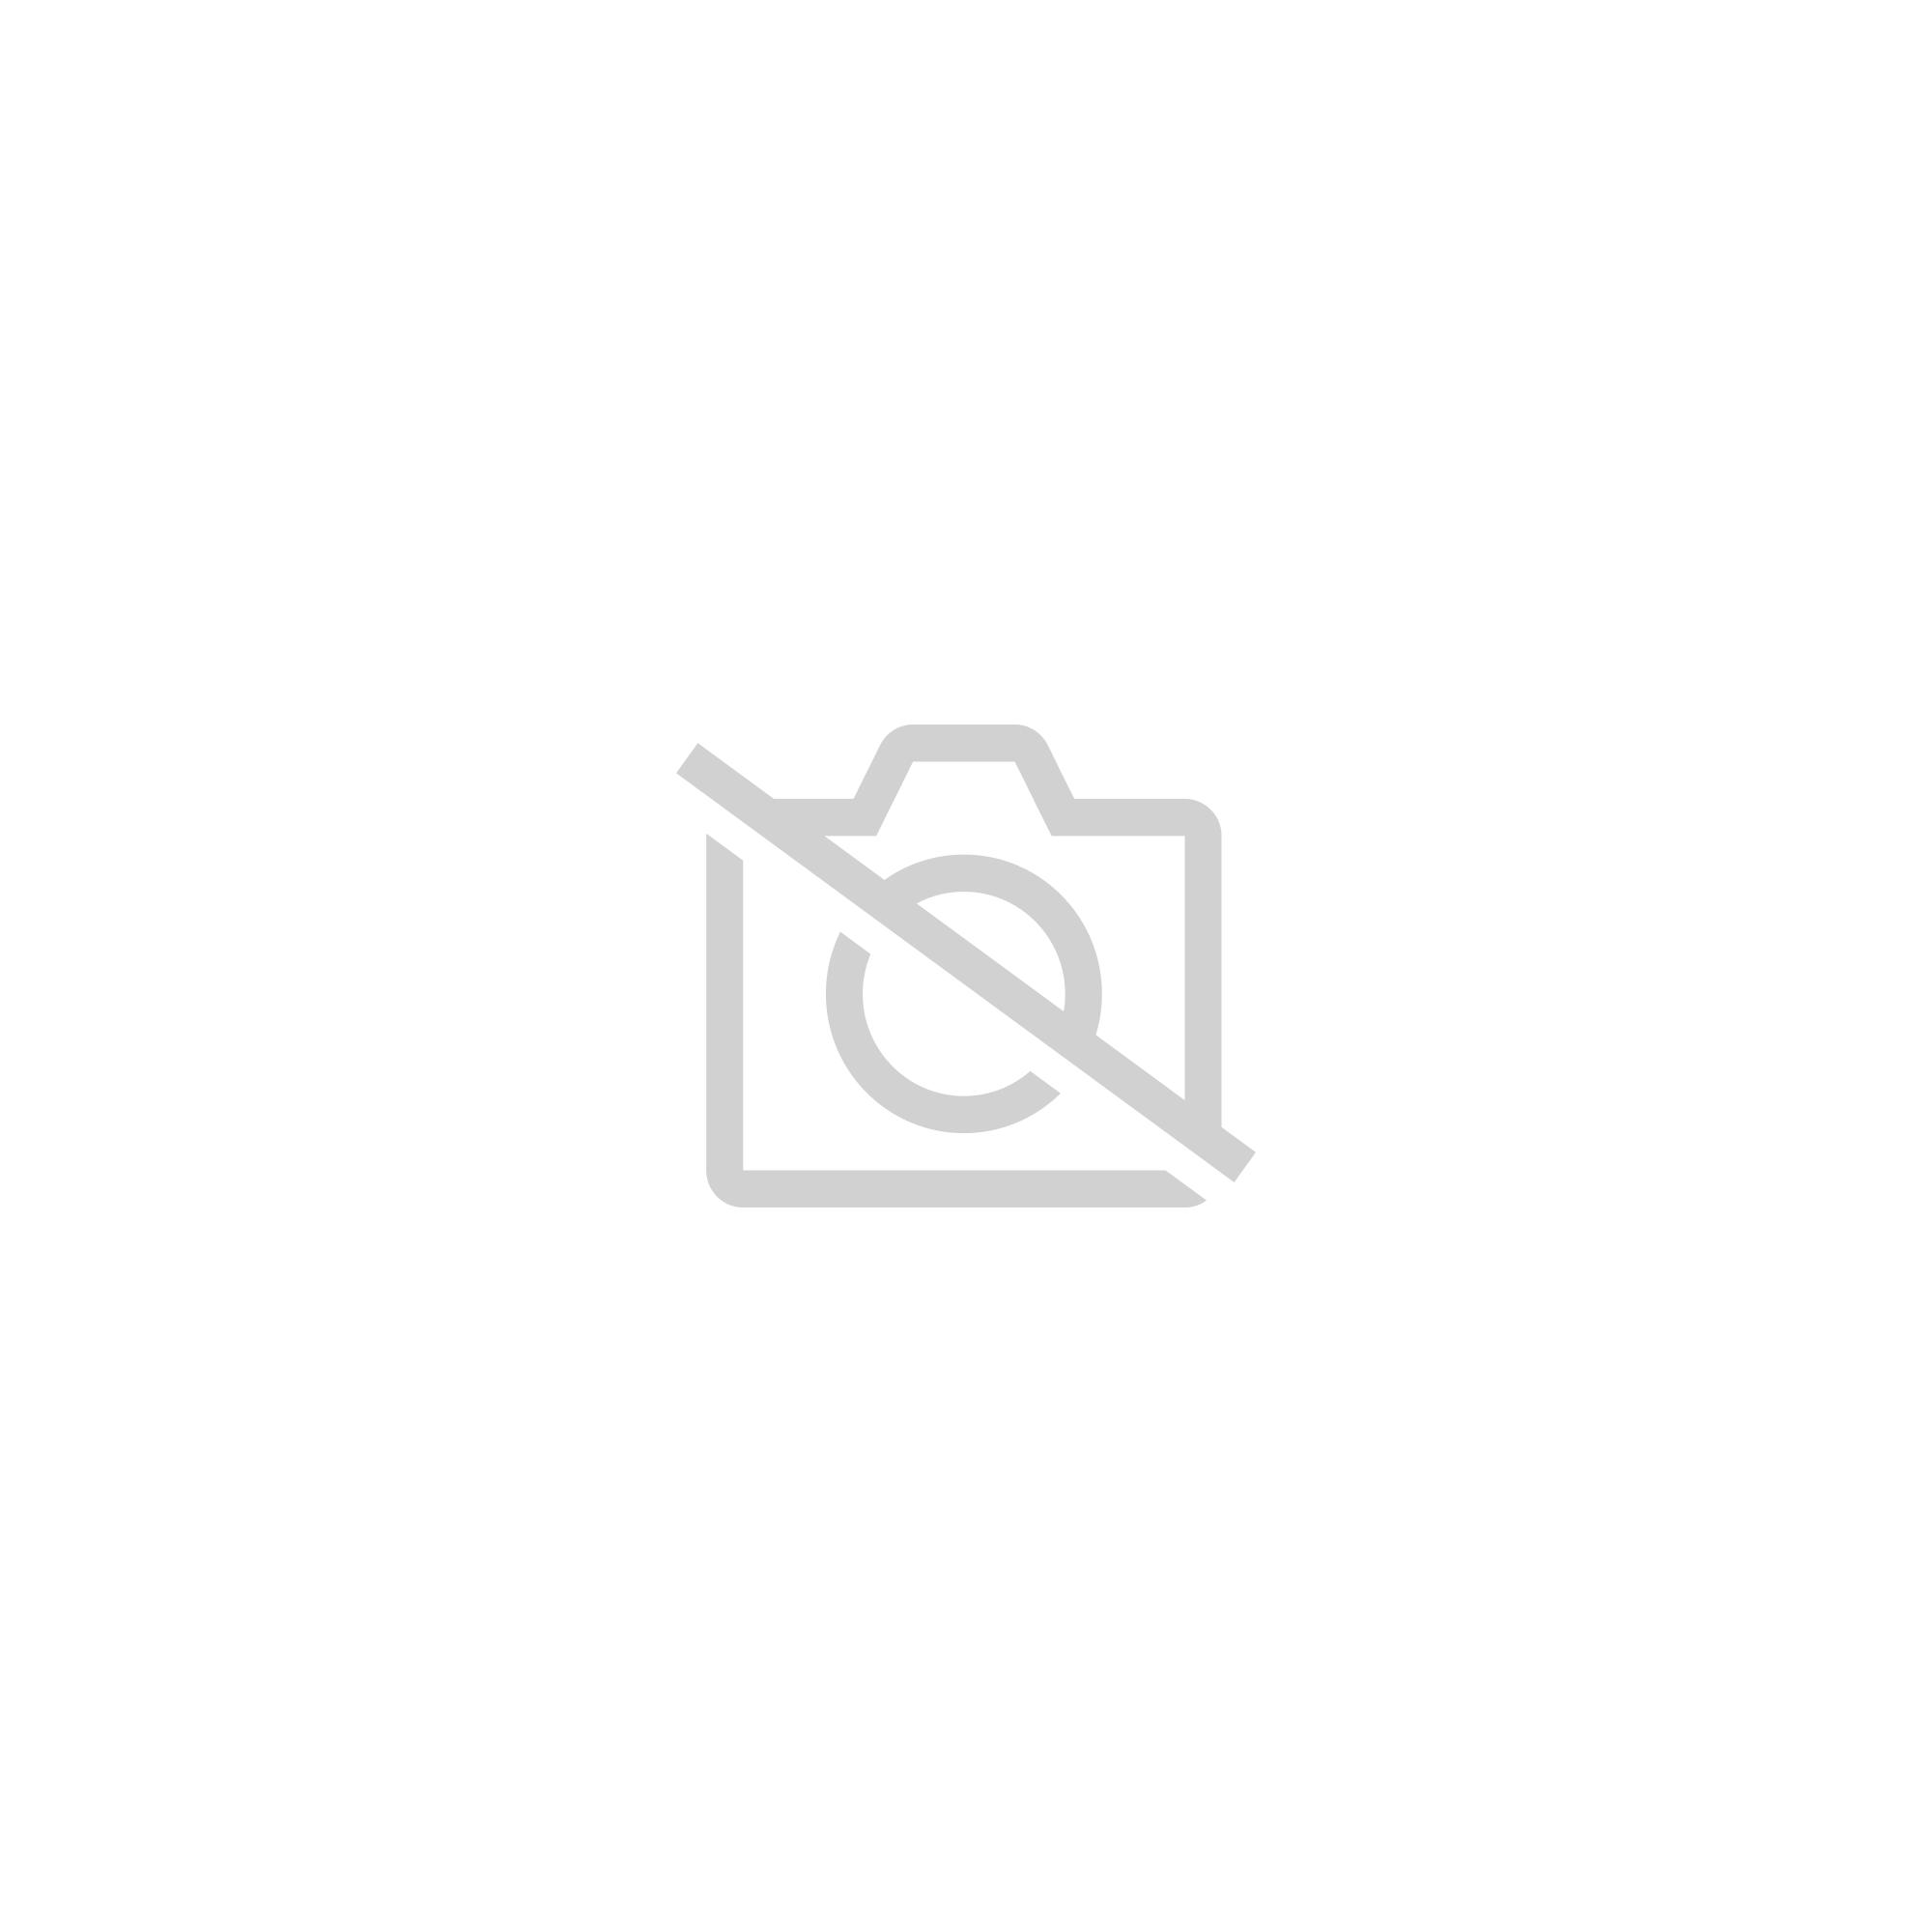 Achat Garçon Vente Stormtrooper Boxer Freegun Wars Et Star Rakuten sthdCxrQ